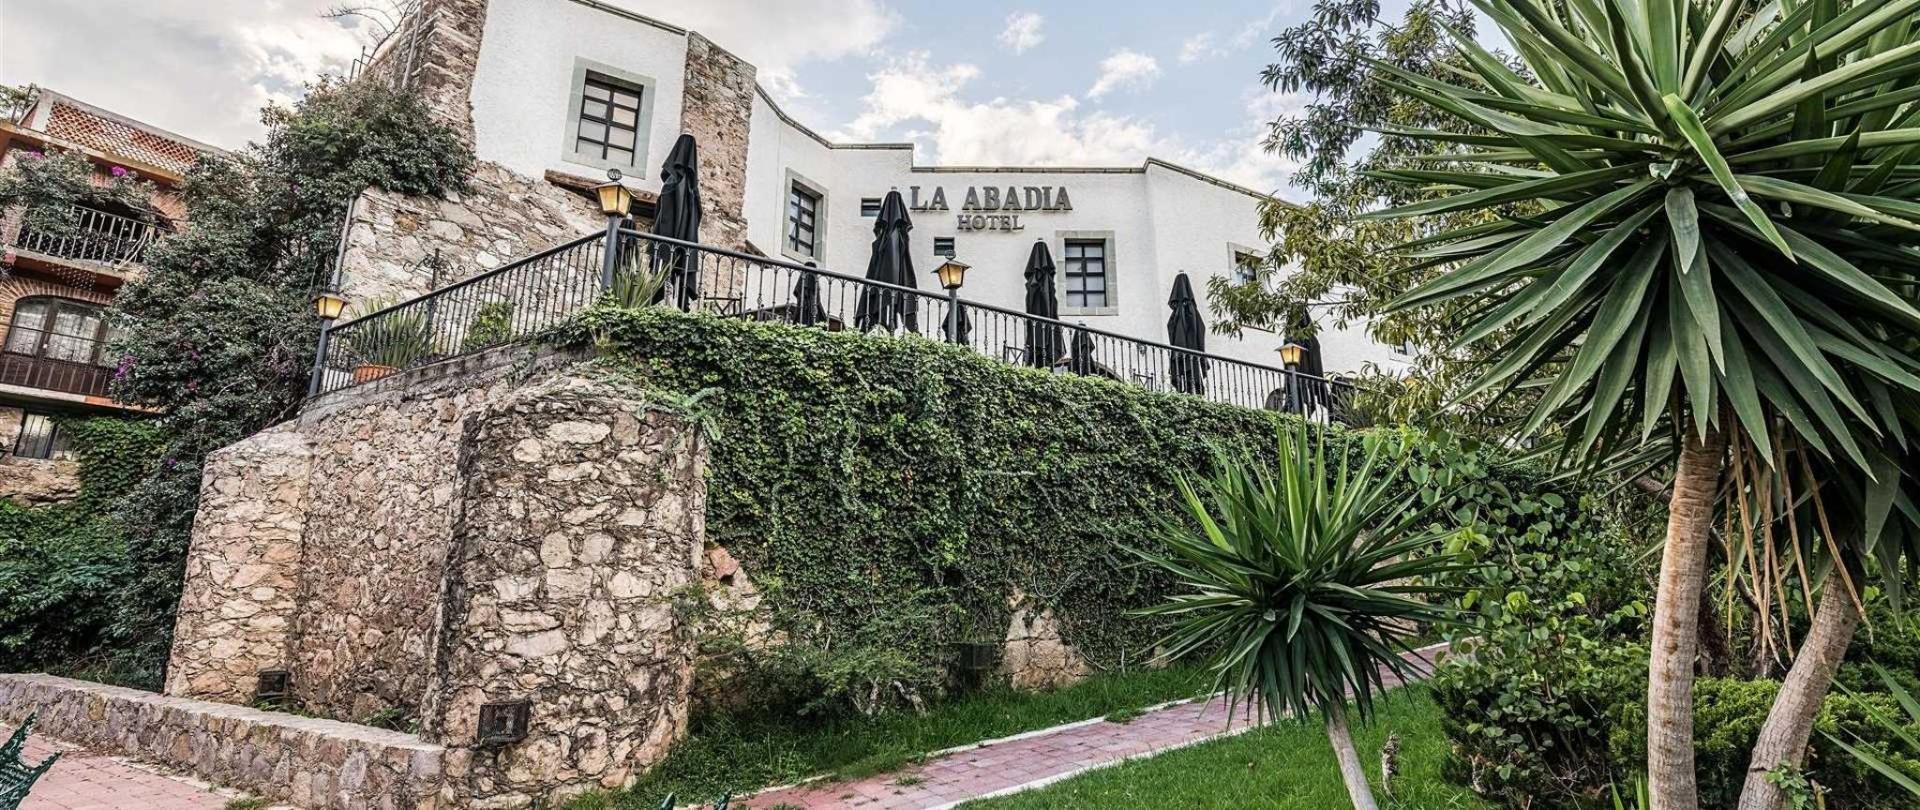 homepage-la-abadia-hotel-guanajuato-mexico.jpeg